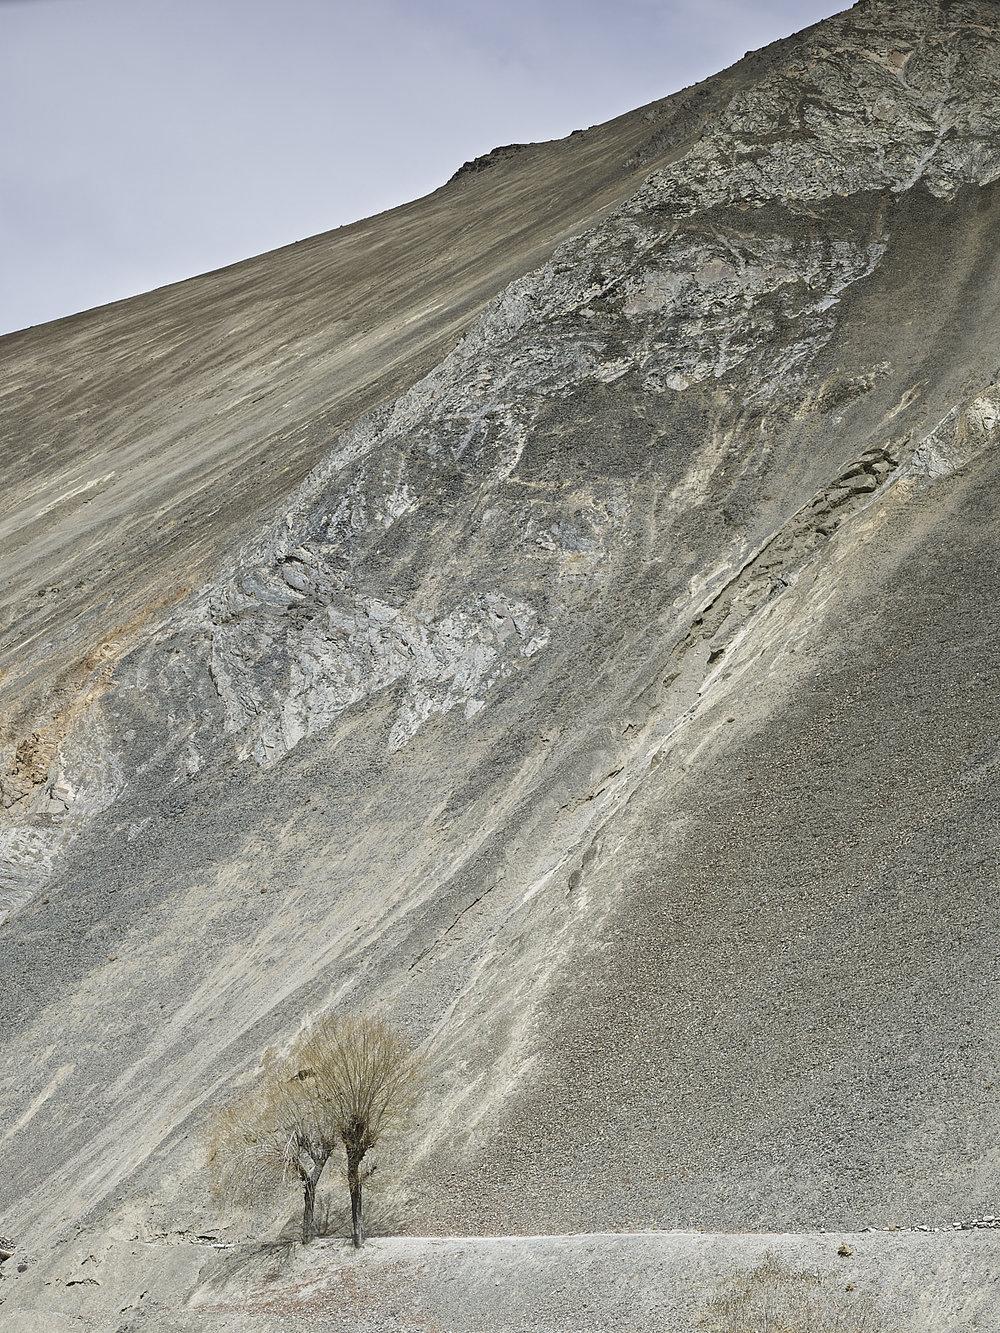 sand 12, Ladakh, India, 2018